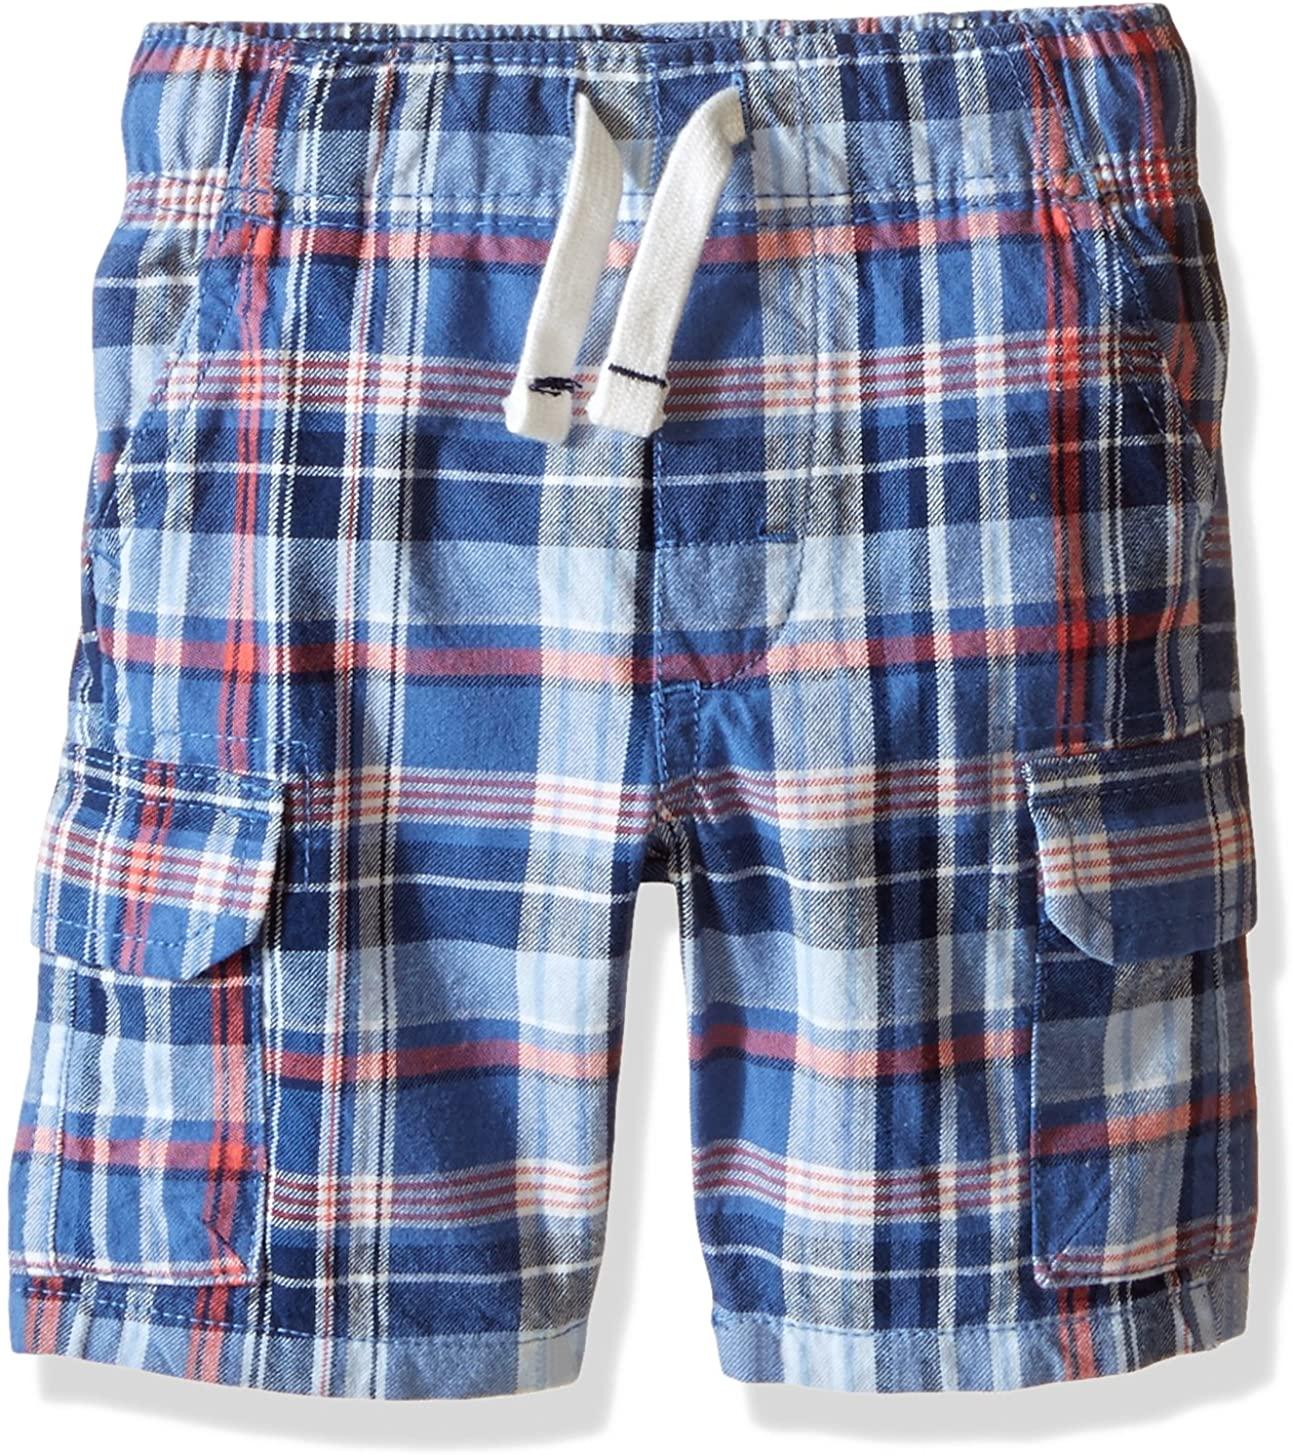 Carter's Boys' Plaid Canvas Shorts 248g176